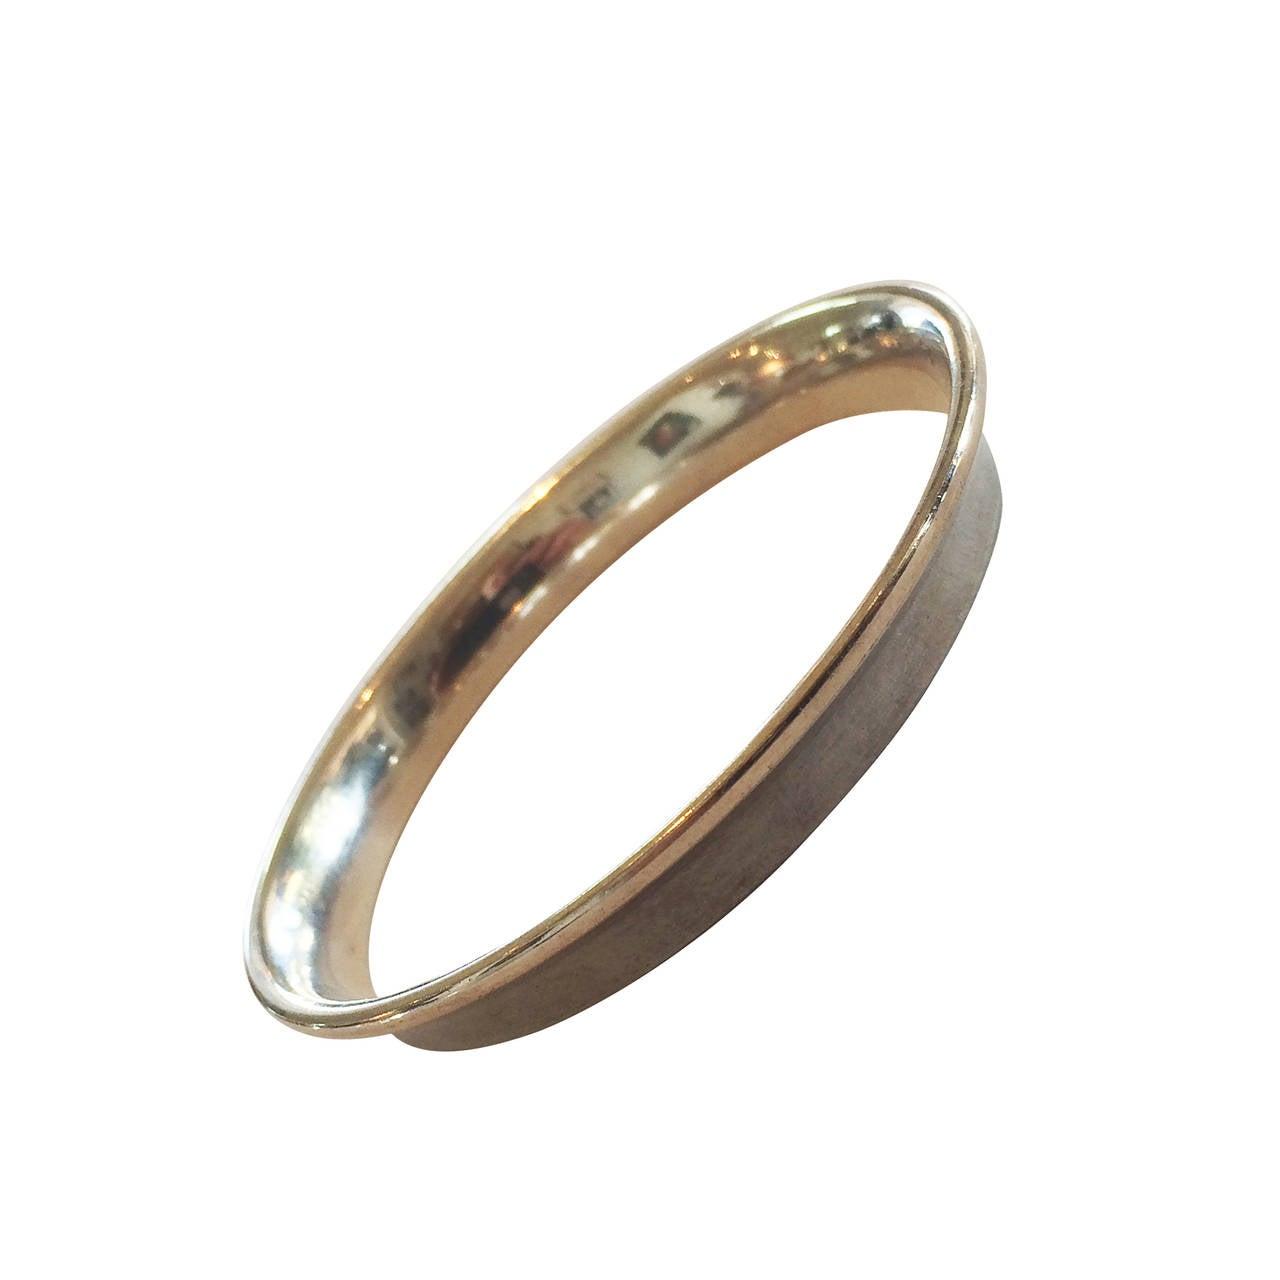 Georg Jensen bangle bracelet designed by Nanna Ditzel Modernist 1